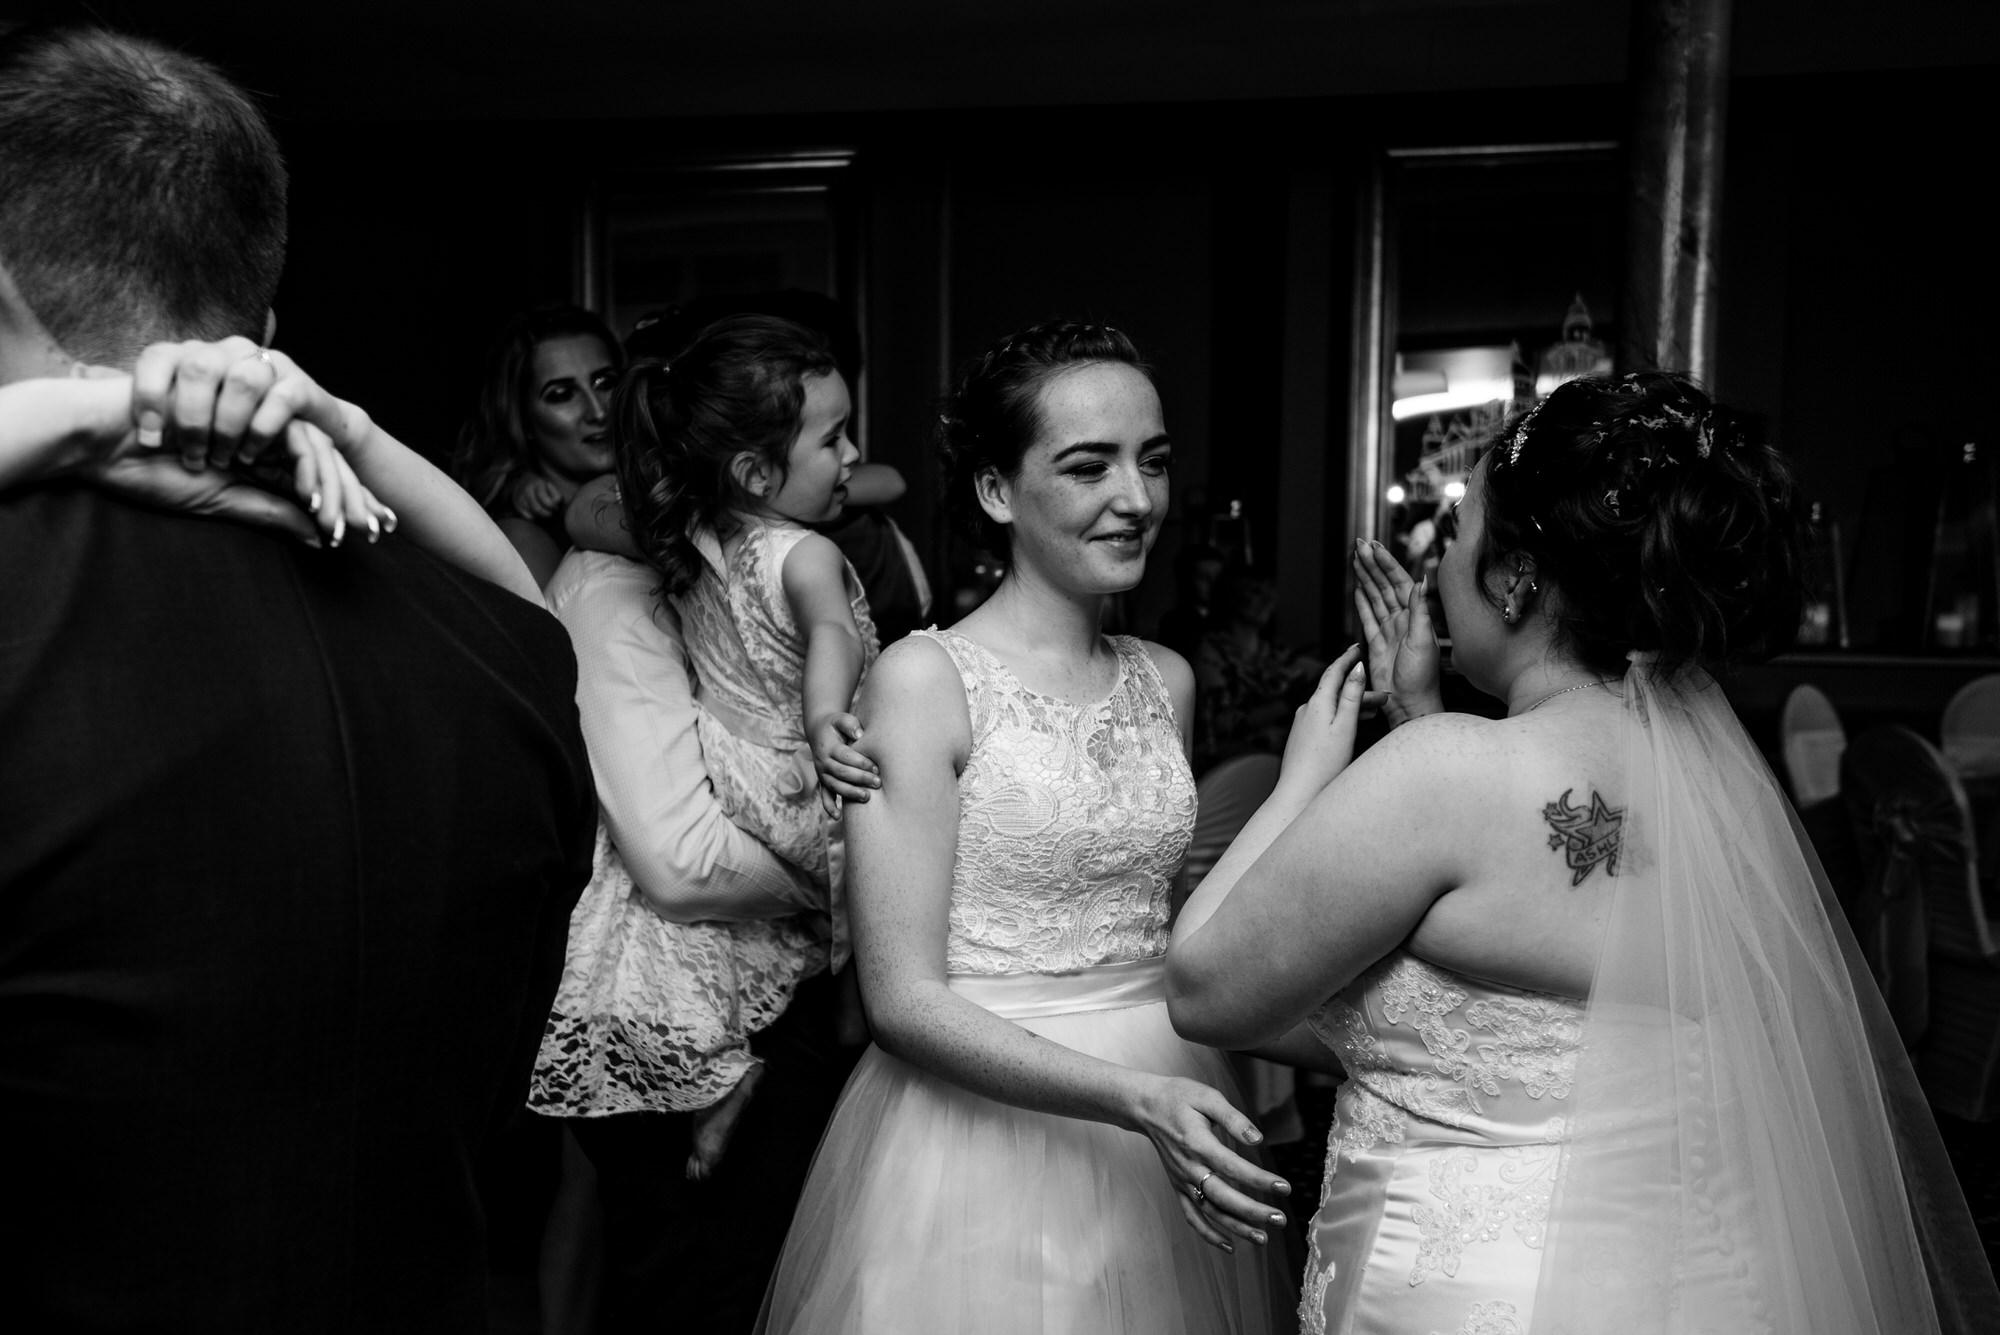 wedding photographer belfast ten square hotel first dance bride bridesmaid